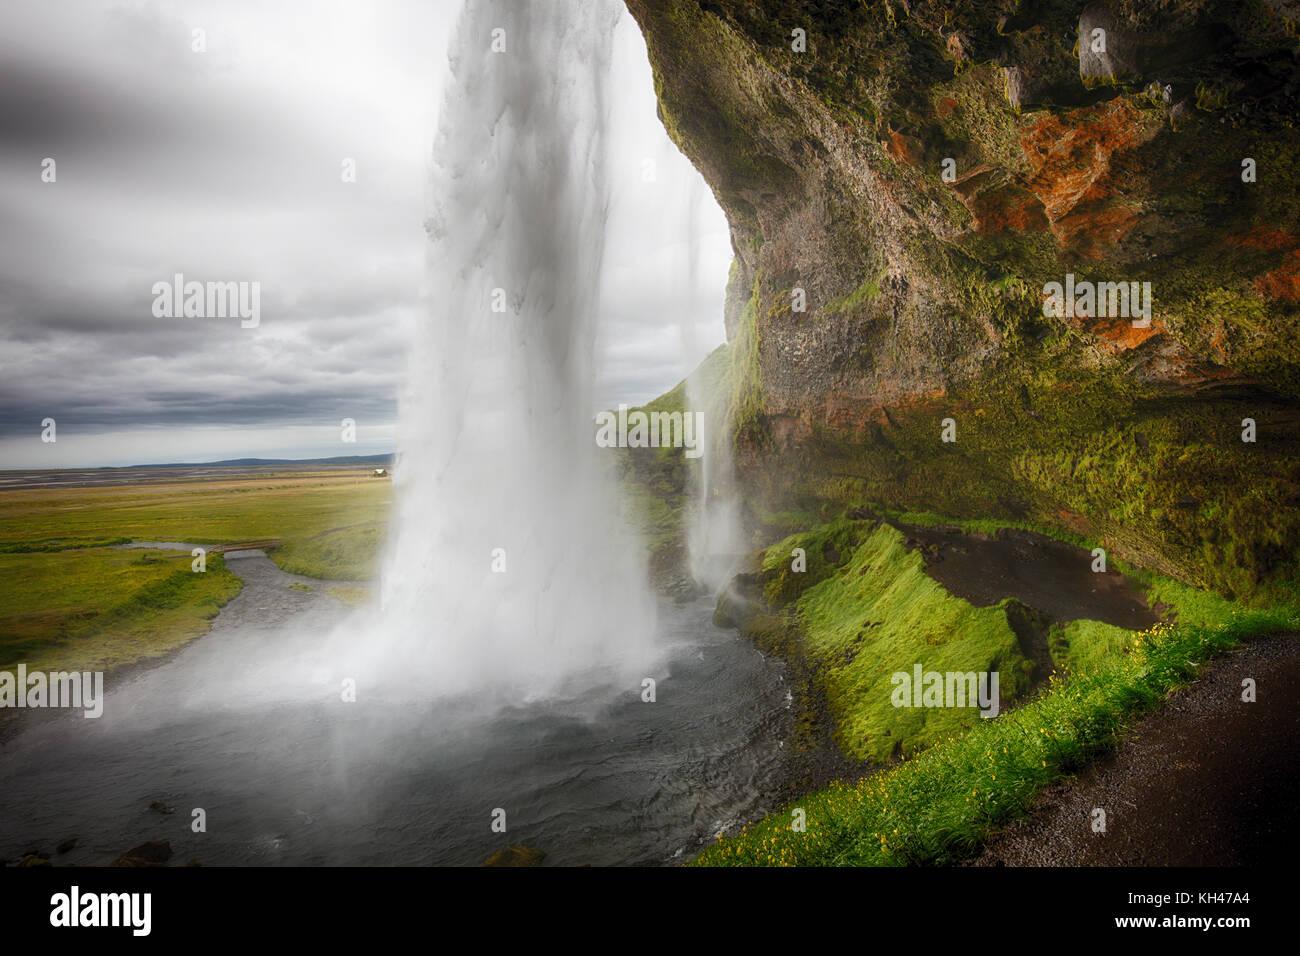 Blick auf den Wasserfall hinter seljalandafoss aus einer Höhle, Island Stockbild